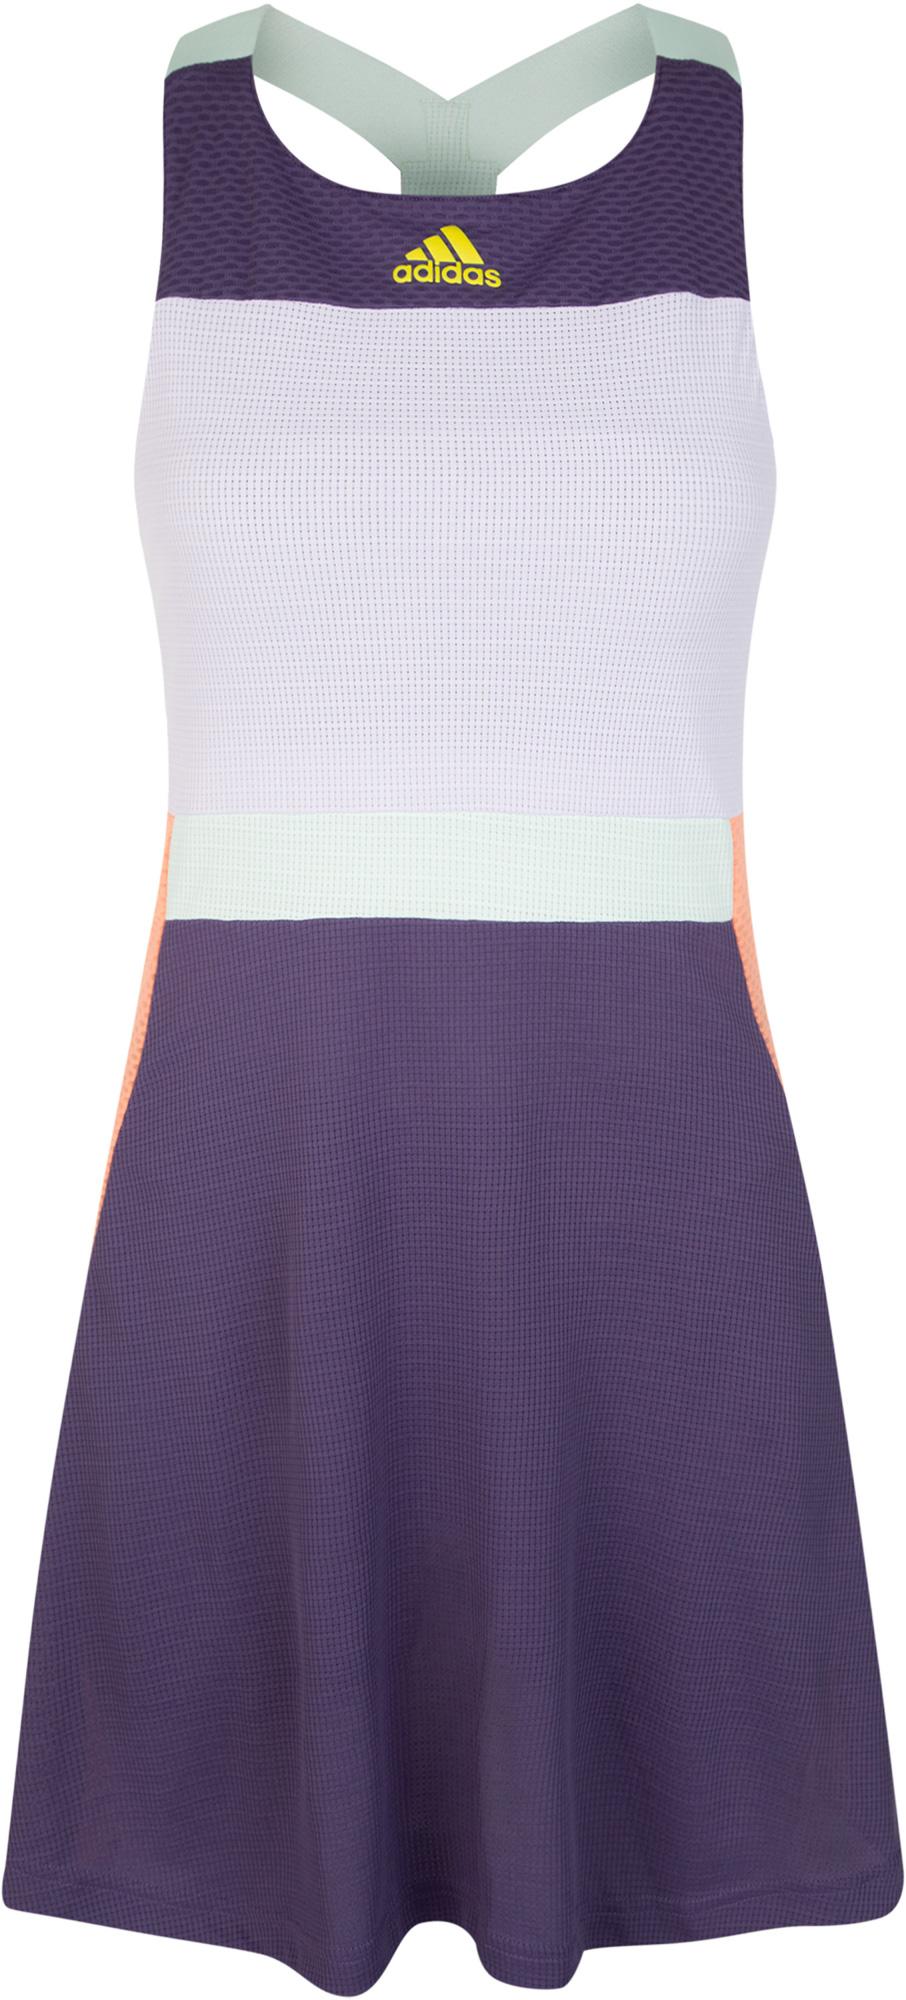 Adidas Платье женское adidas Gameset HEAT.RDY, размер 38-40